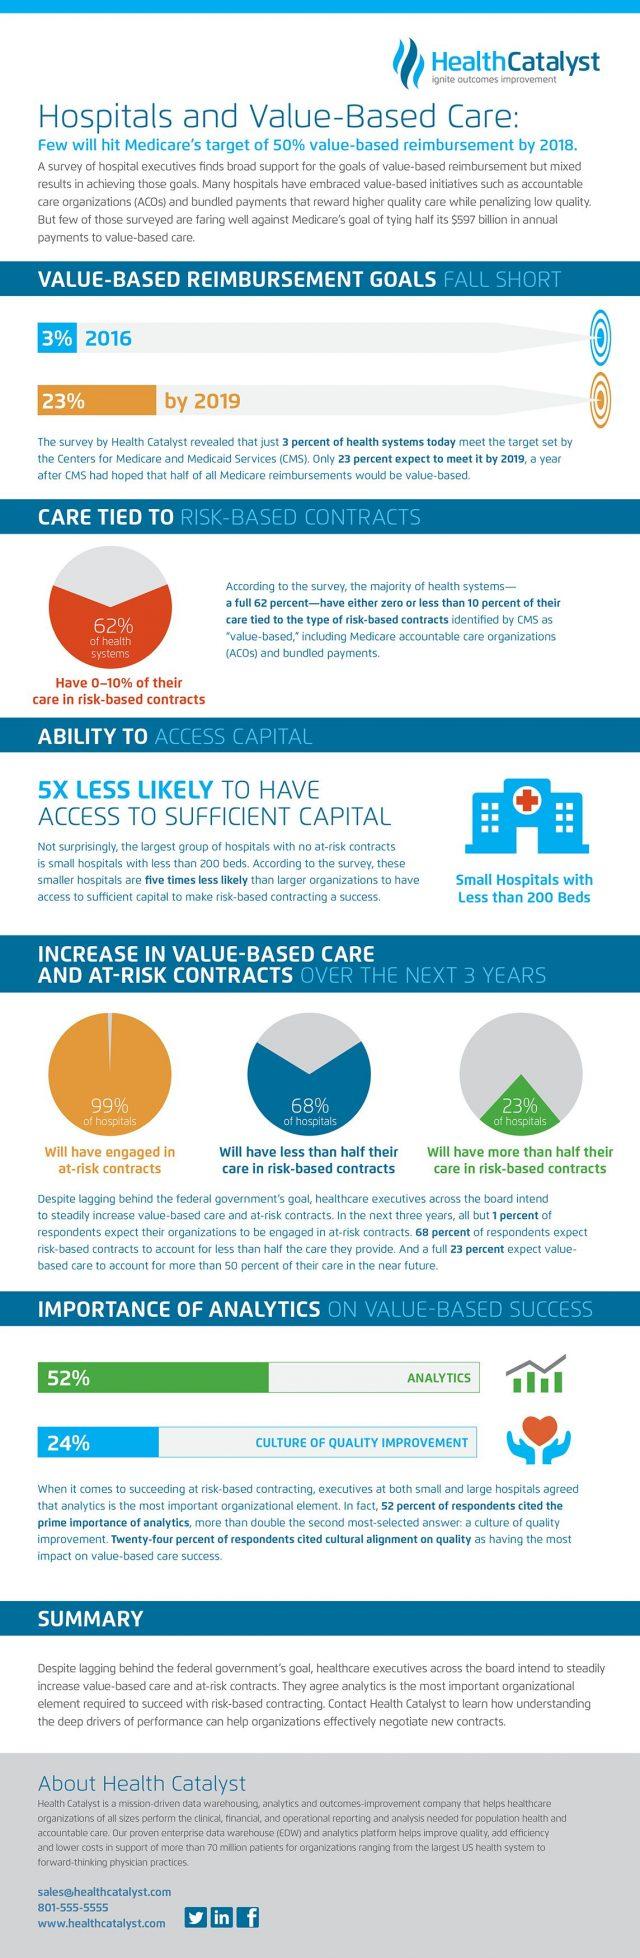 Hospitals Progress to Value Based Reimbursement